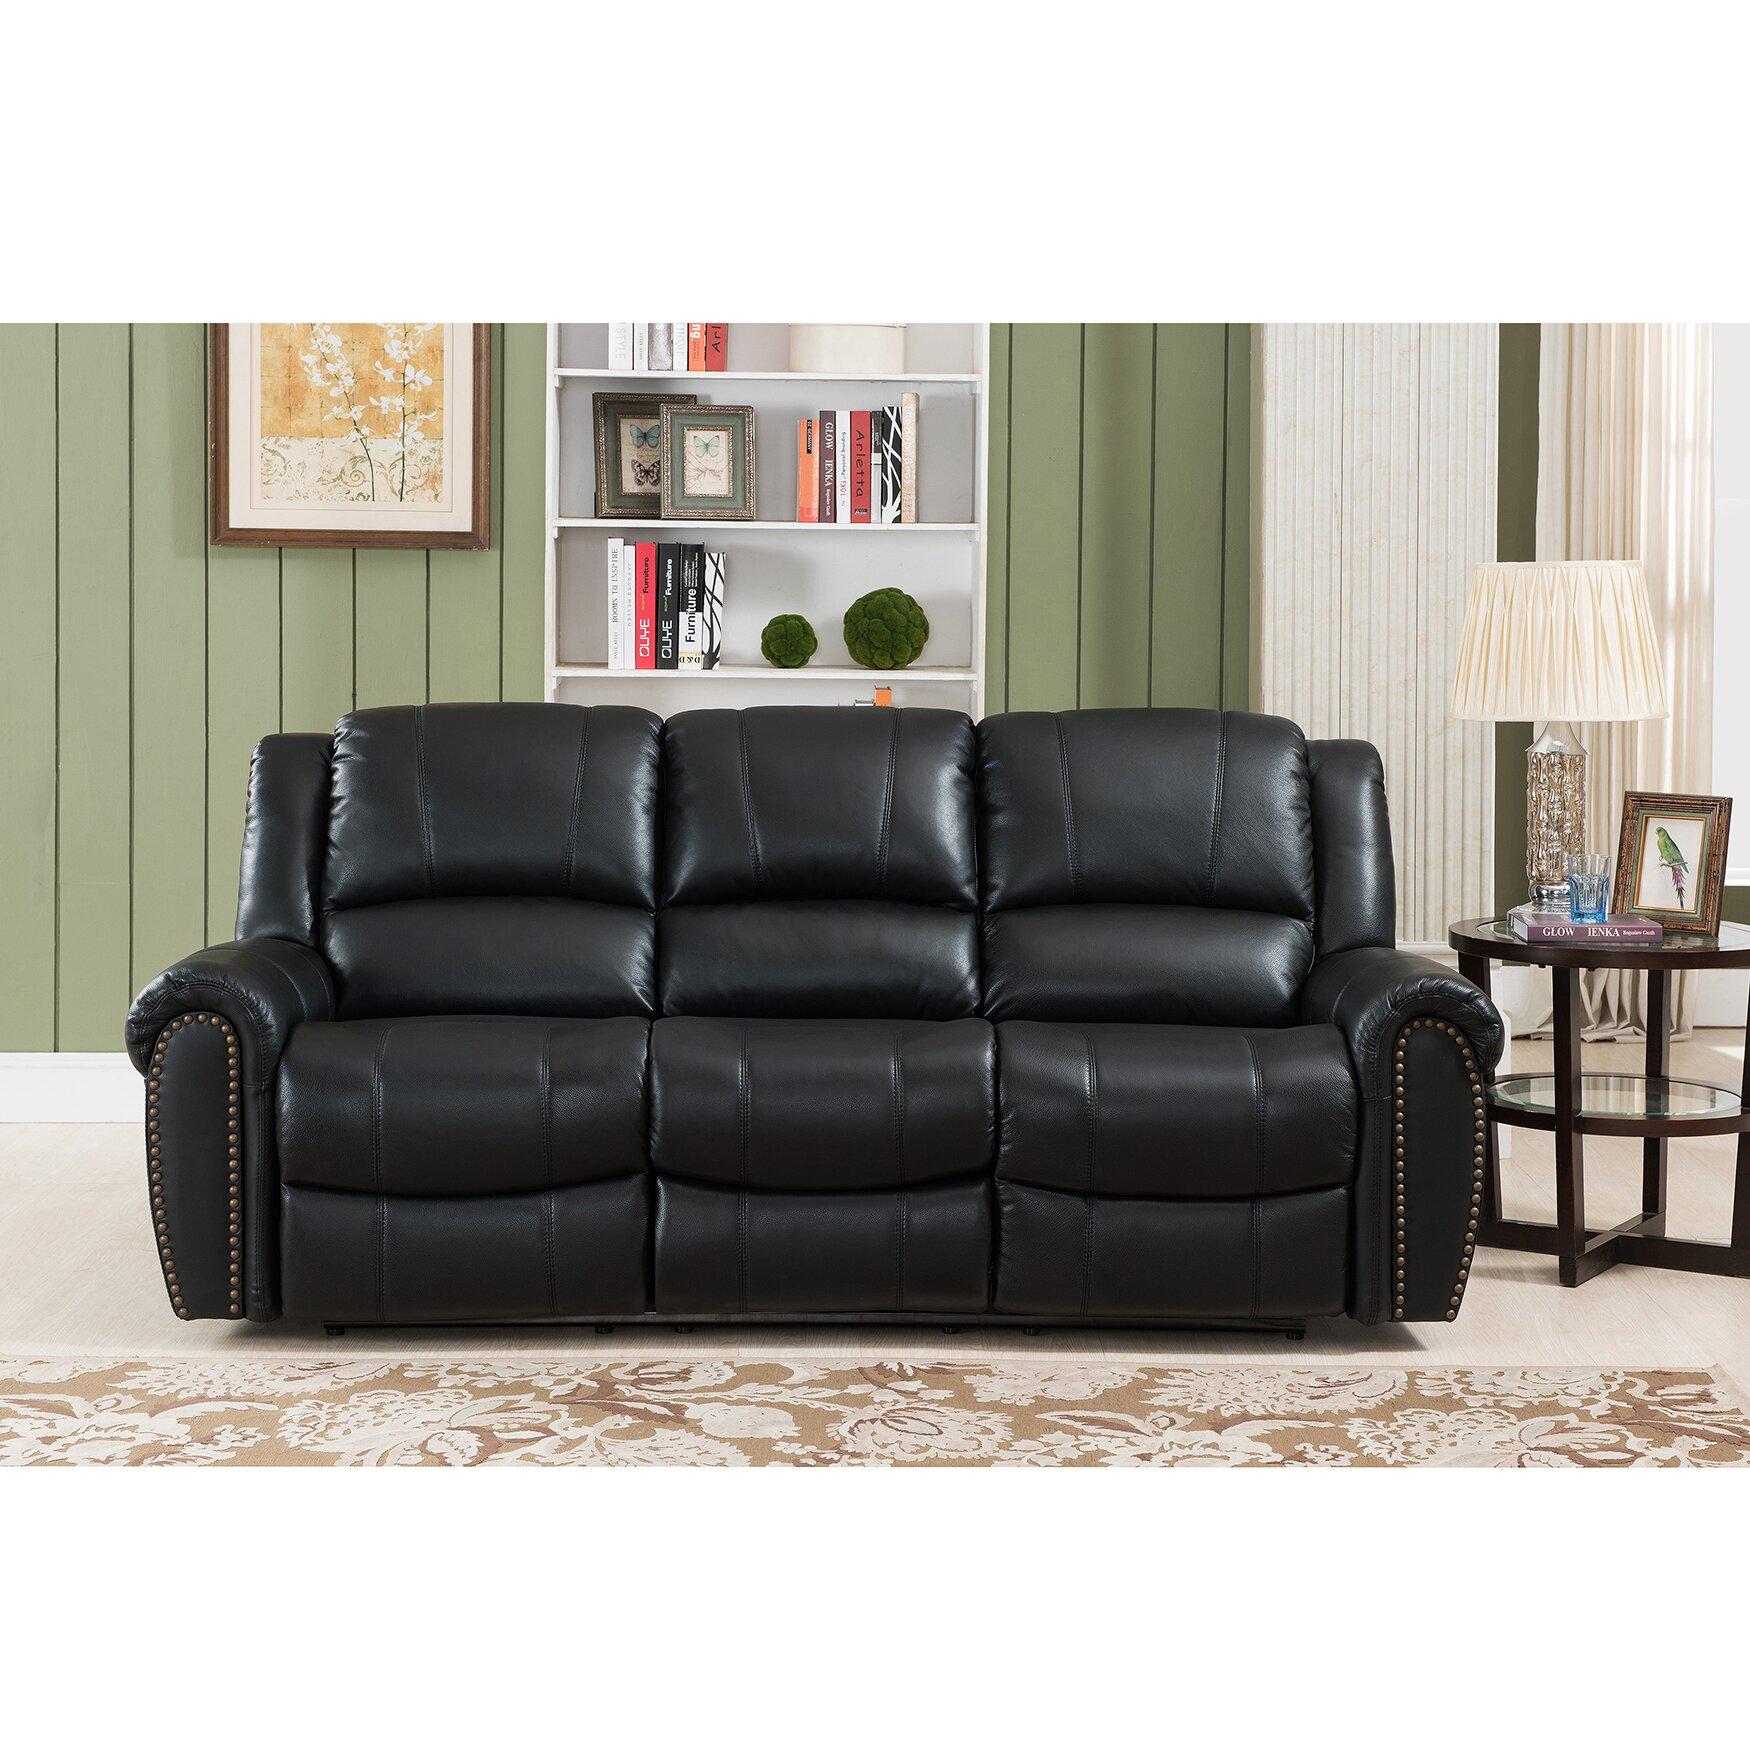 Houston Leather  Piece Living Room Set